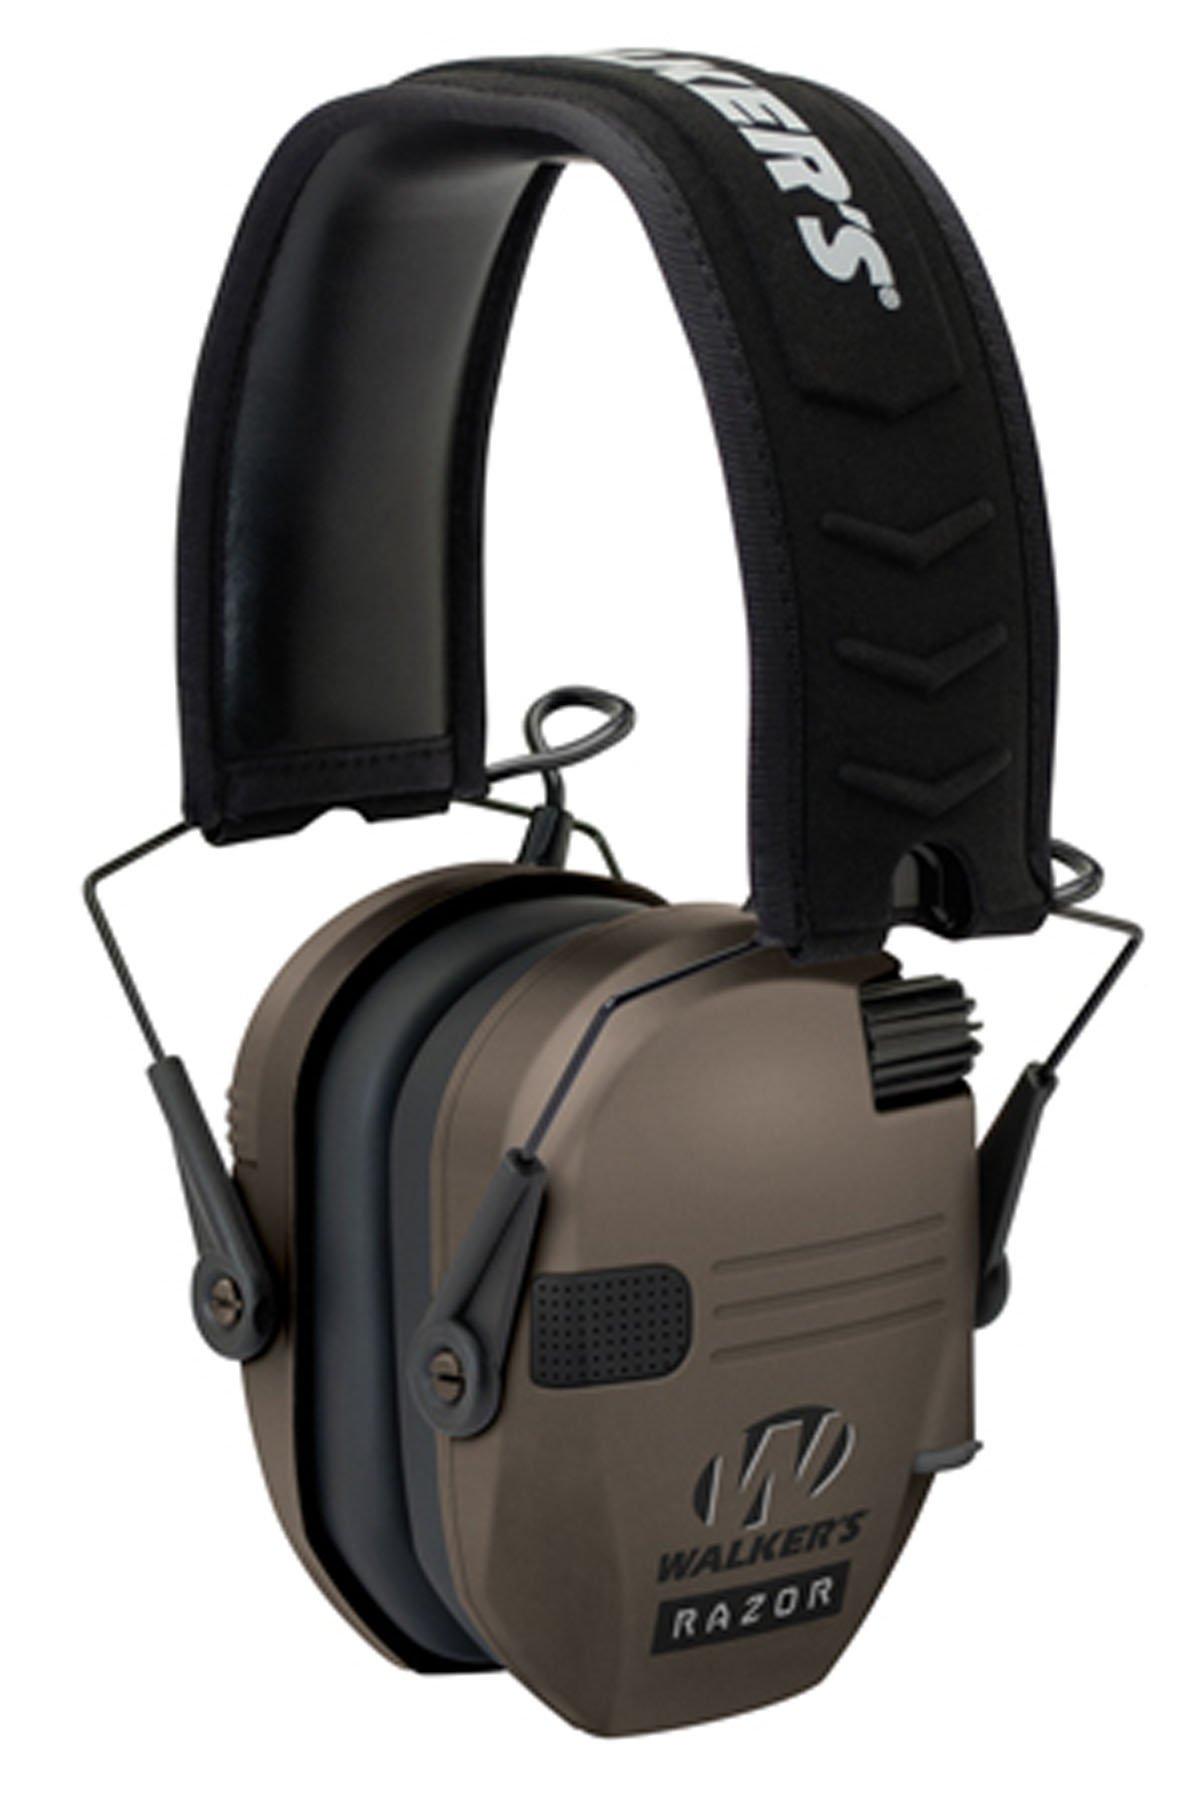 wlk Walkers Game Ear Razor Slim Shooter Folding Earmuff 23 dB Flat Dark Earth